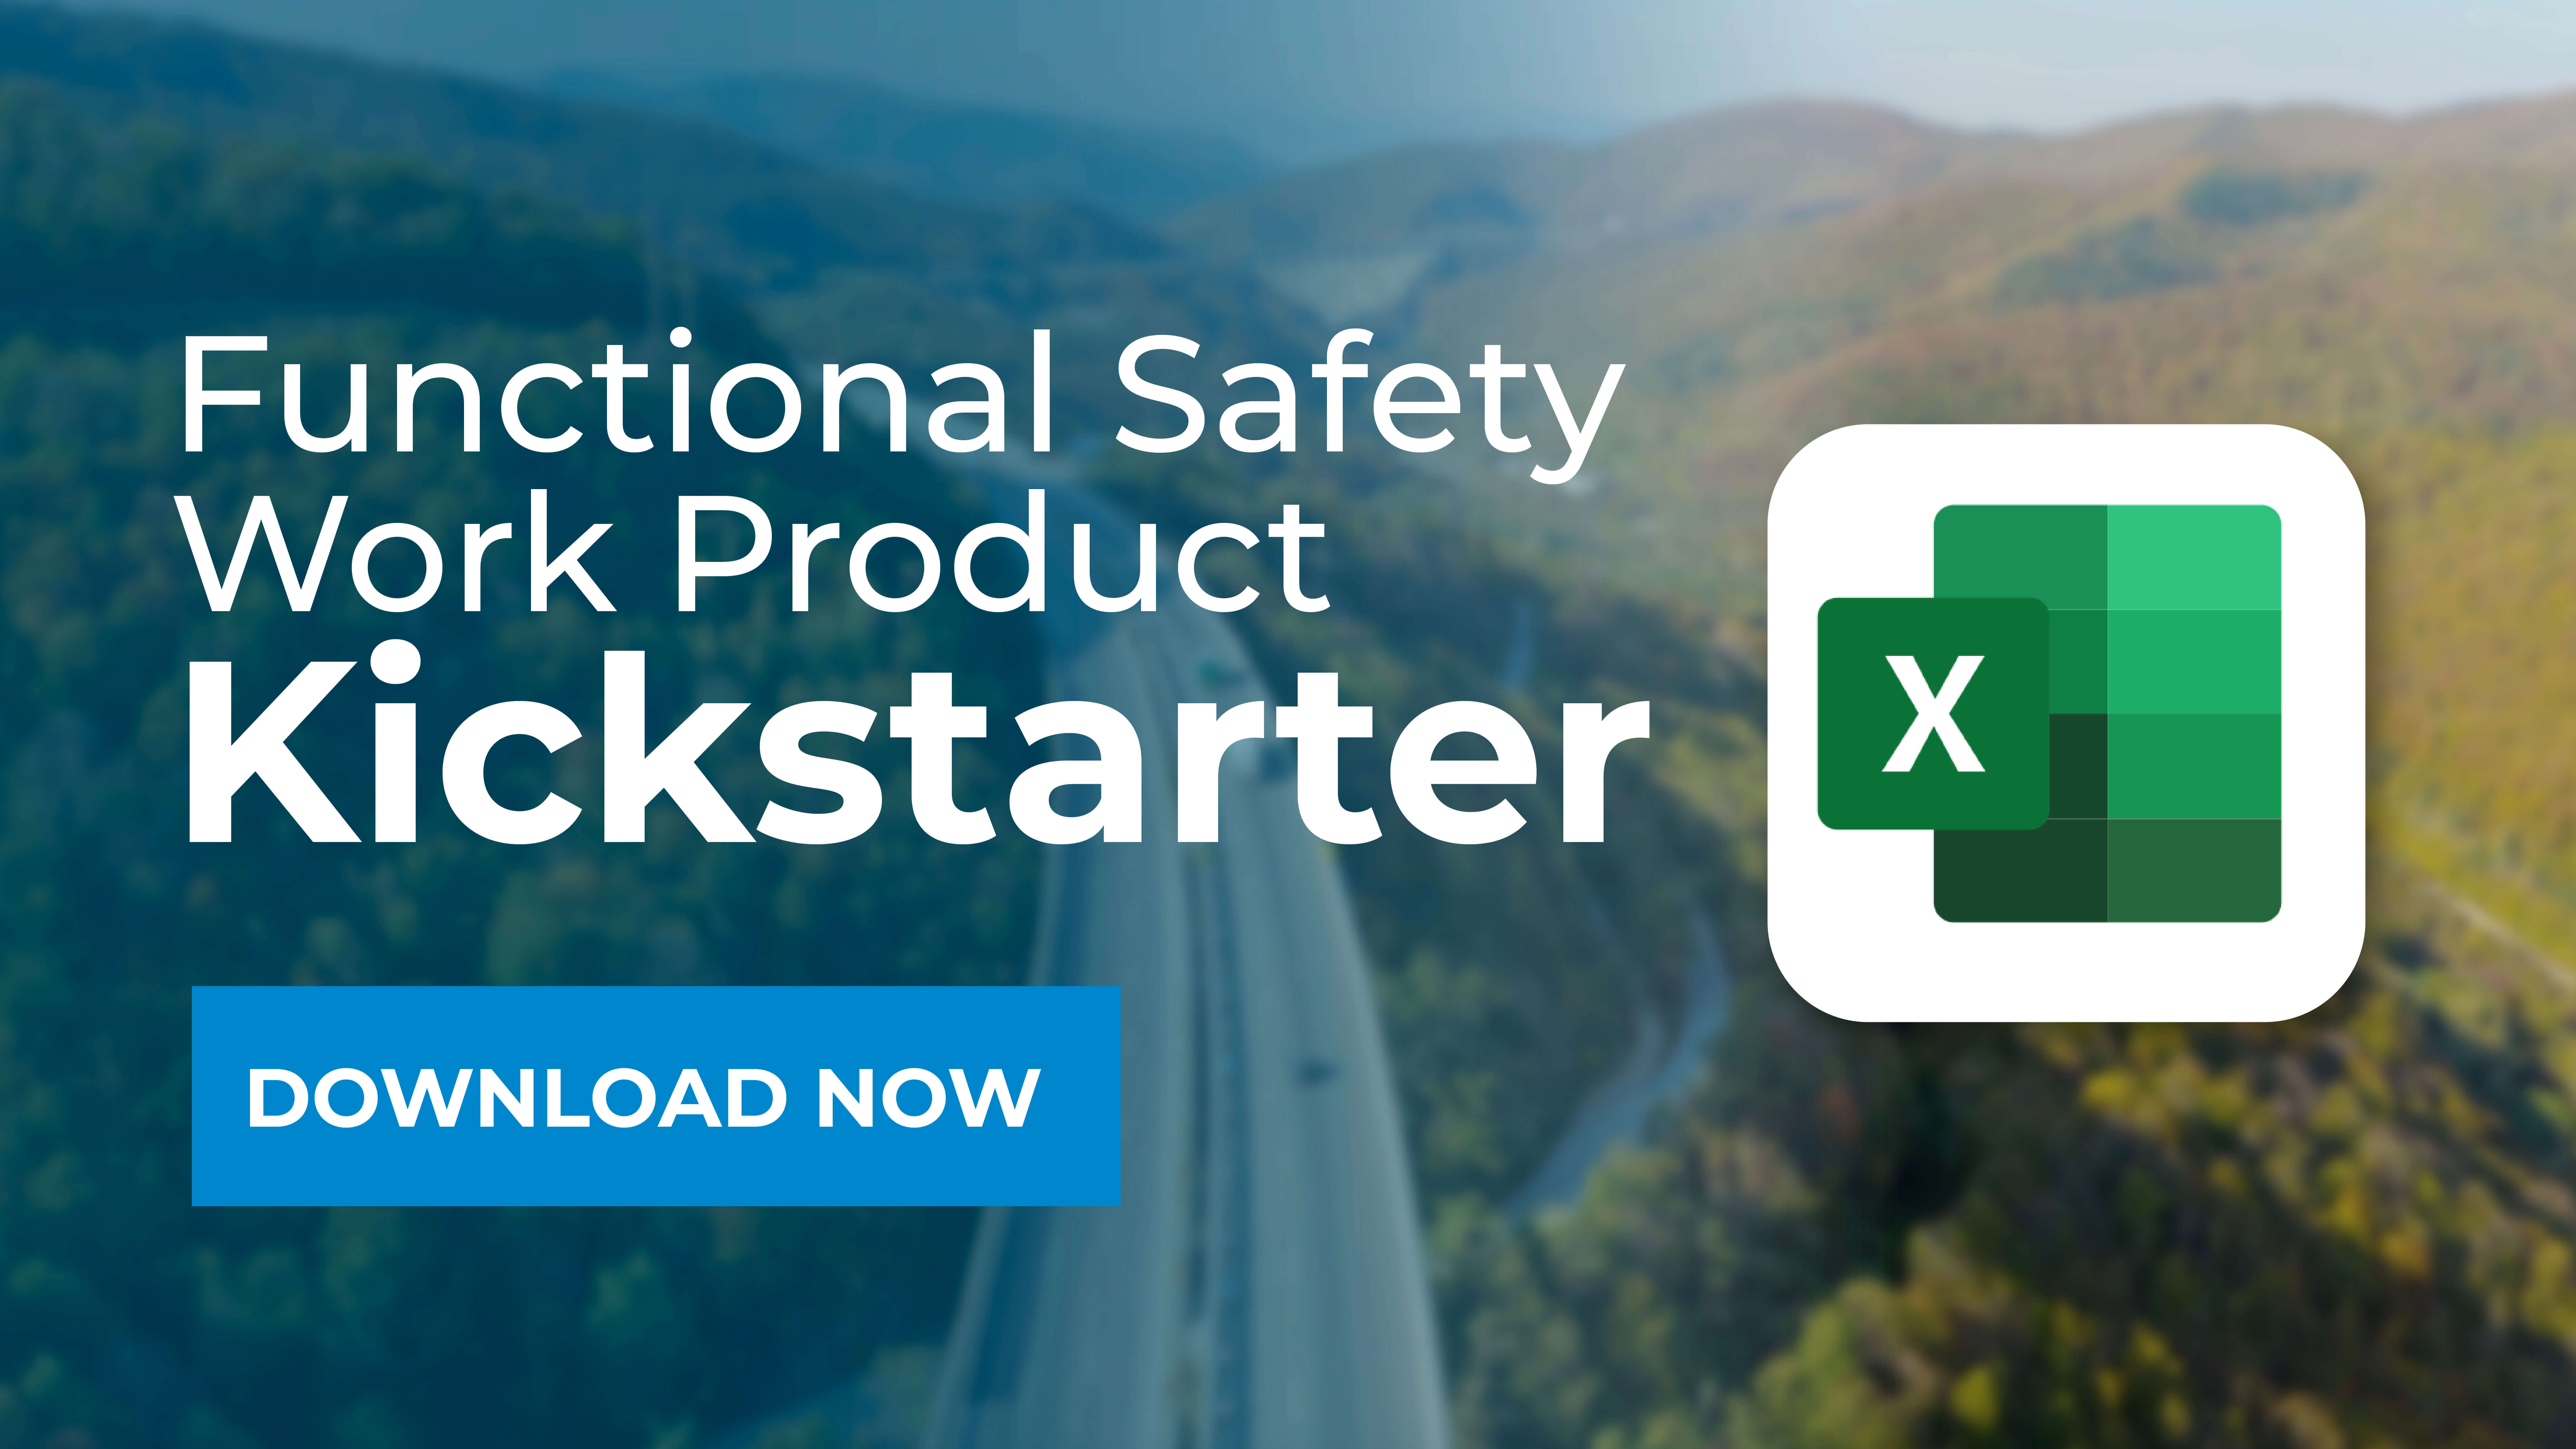 Functional Safety Kickstarter